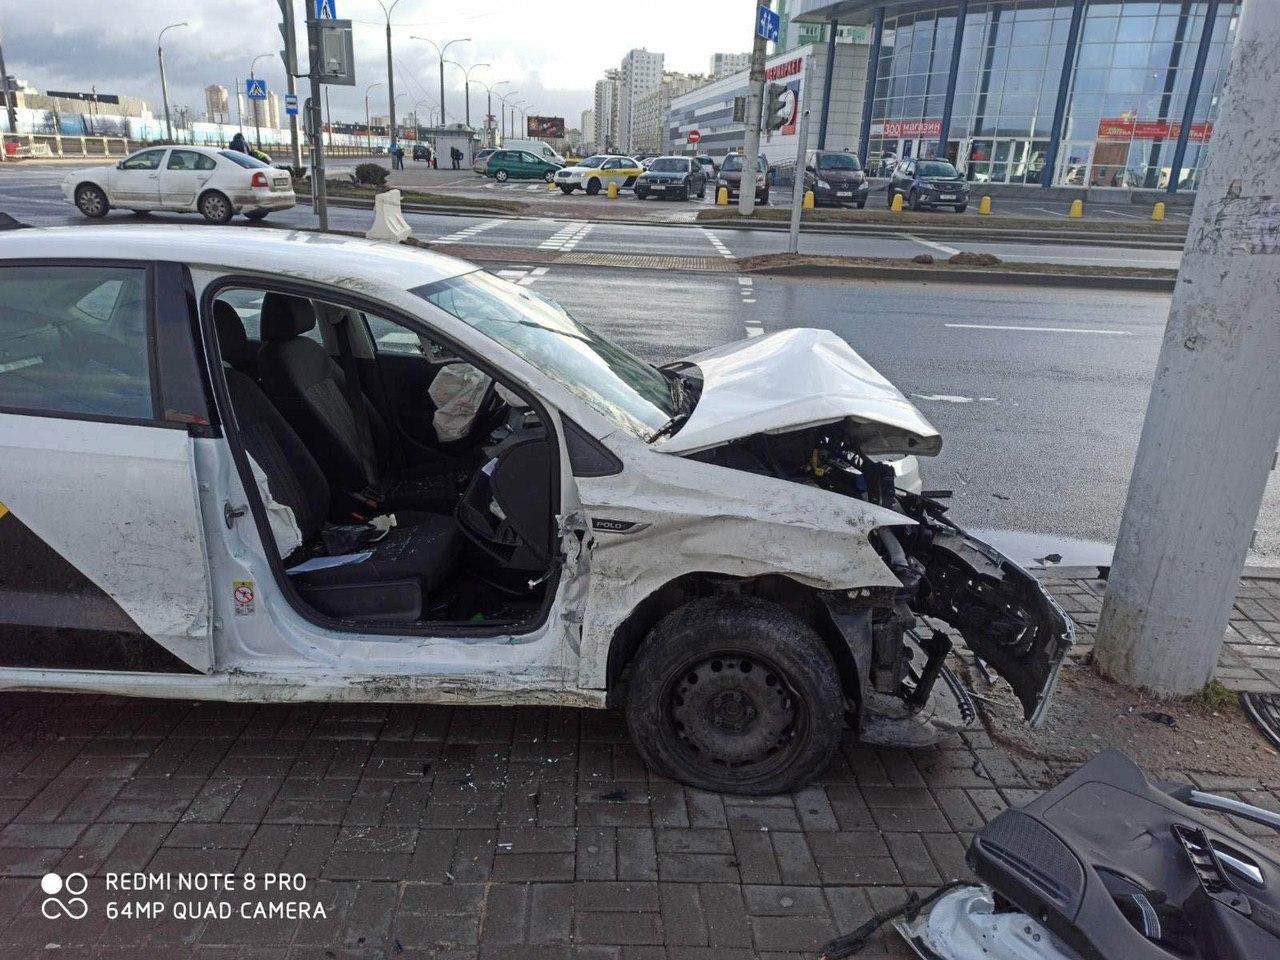 Яндекс-такси спровоцировало ДТП в Минске